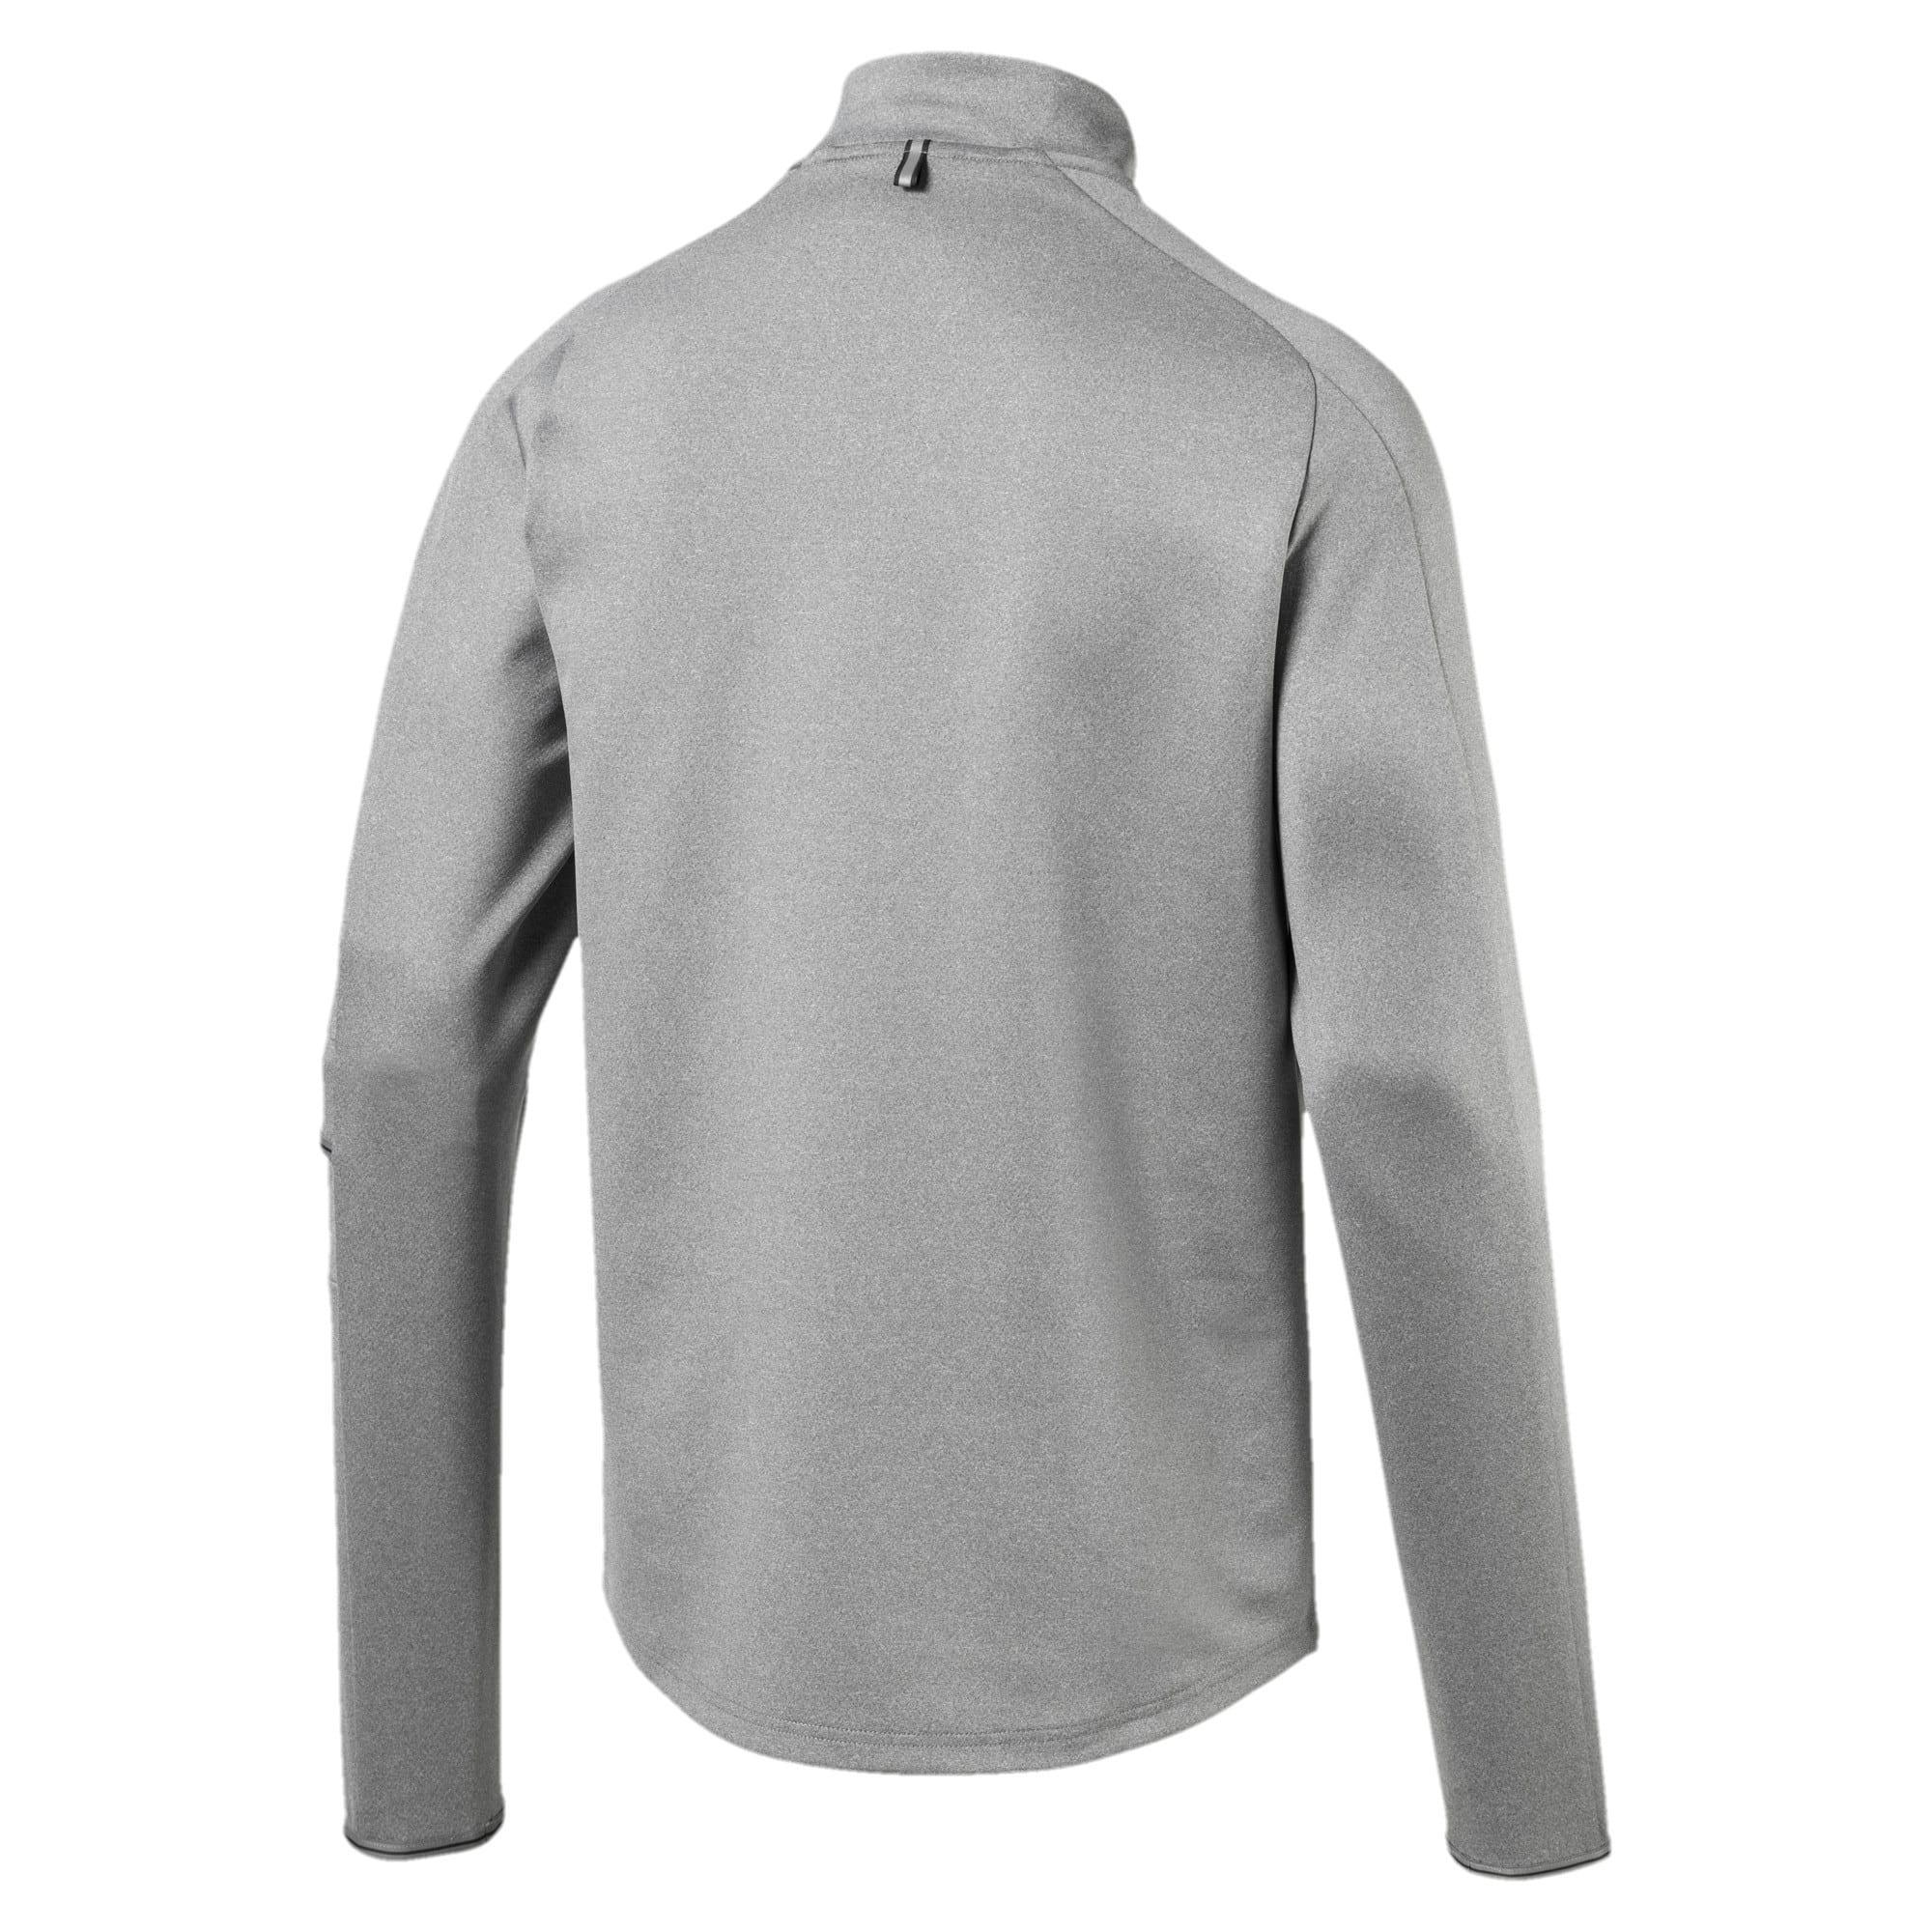 Thumbnail 5 of Tec Half Zip Men's Pullover, Medium Gray Heather, medium-IND